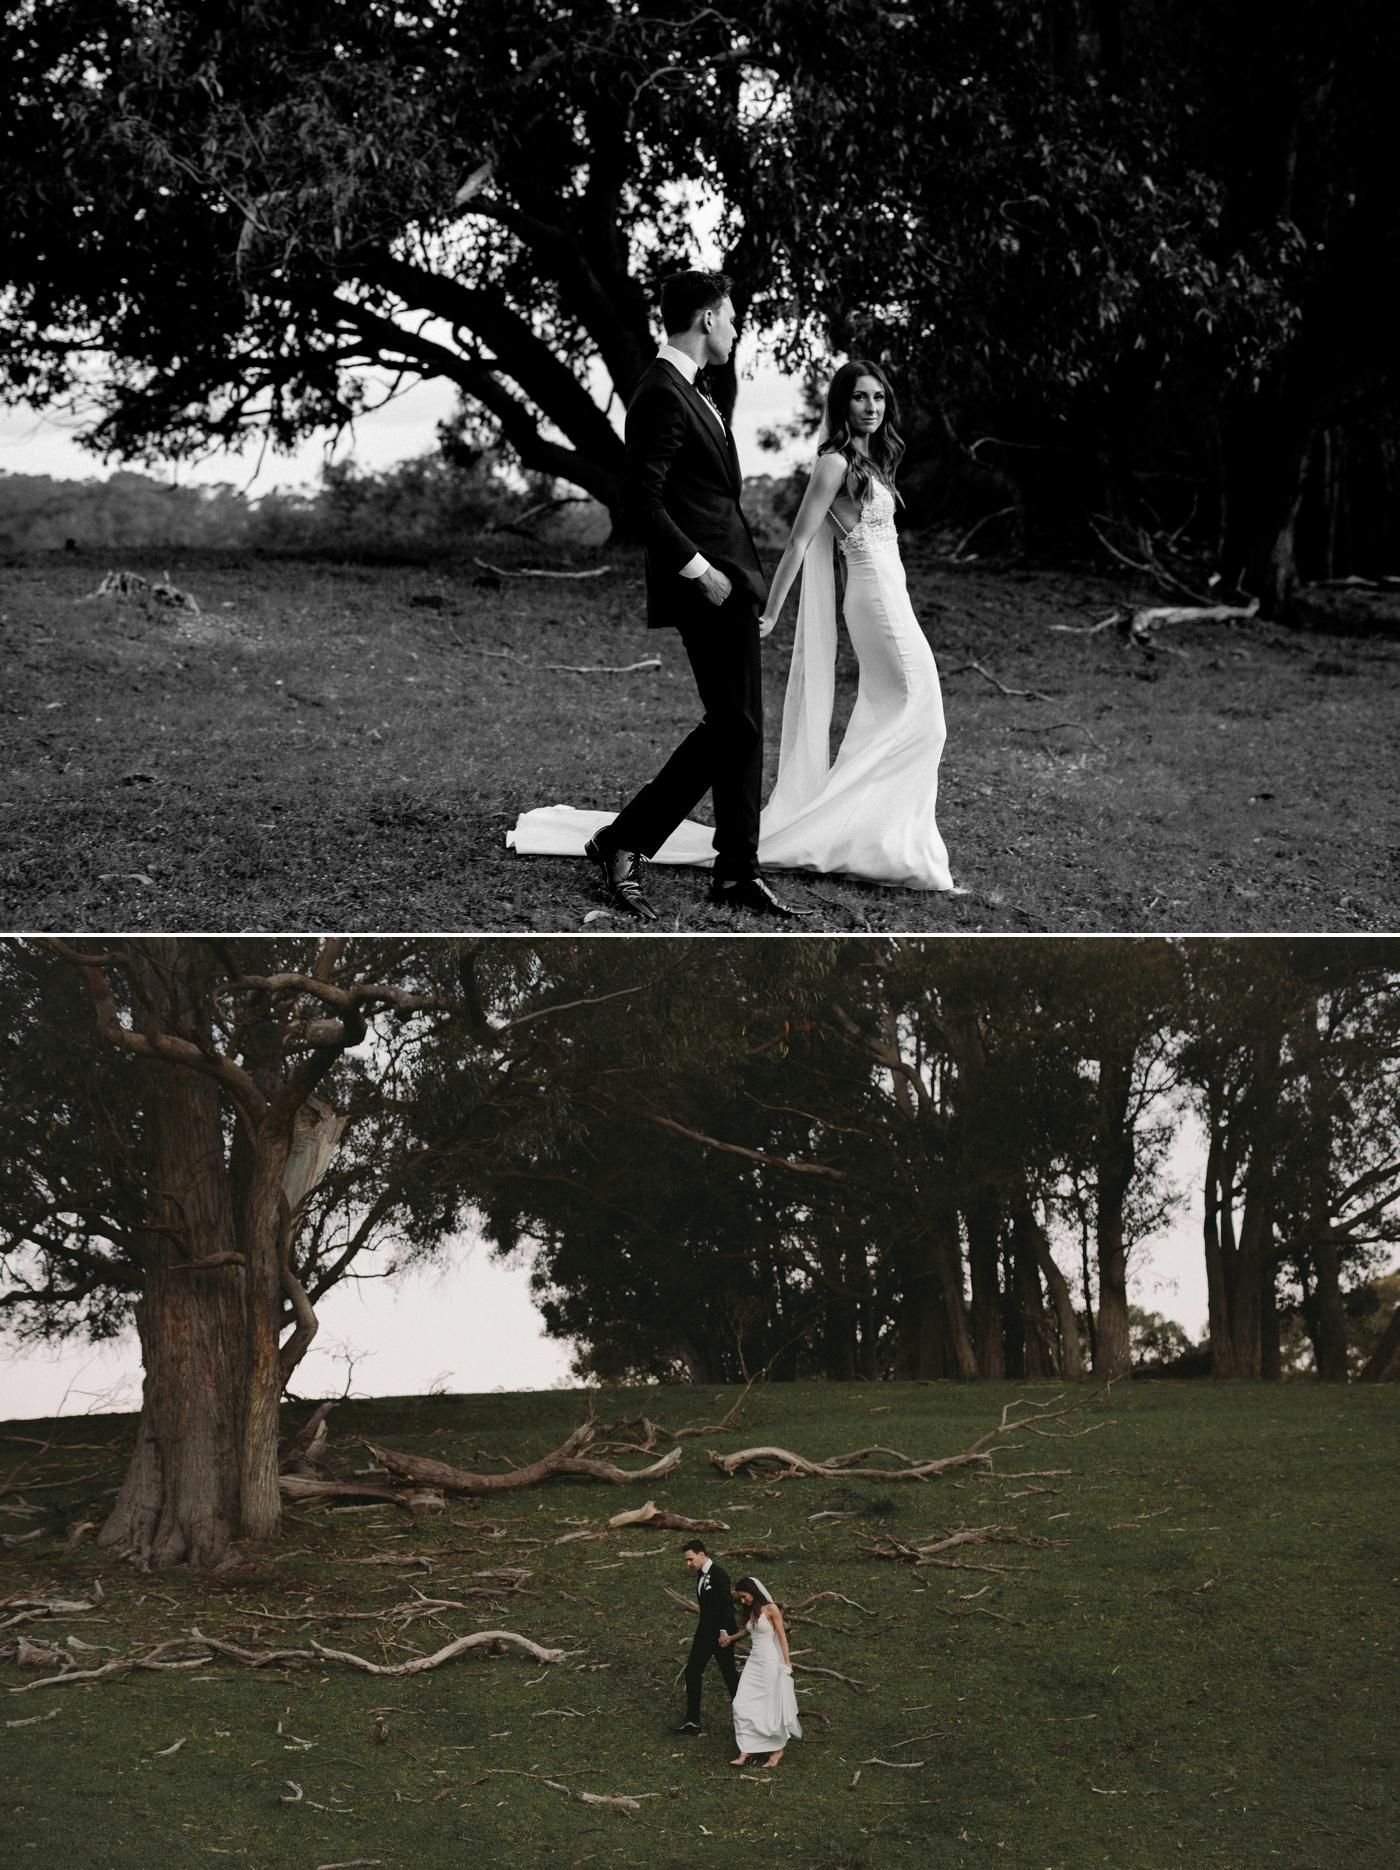 Katie and Ben - Natural Wedding Photography in Adelaide - Beautiful, Candid Wedding Photographer - Adelaide Hills Wedding - Katherine Schultz - www.katherineschultzphotography.com_0069.jpg